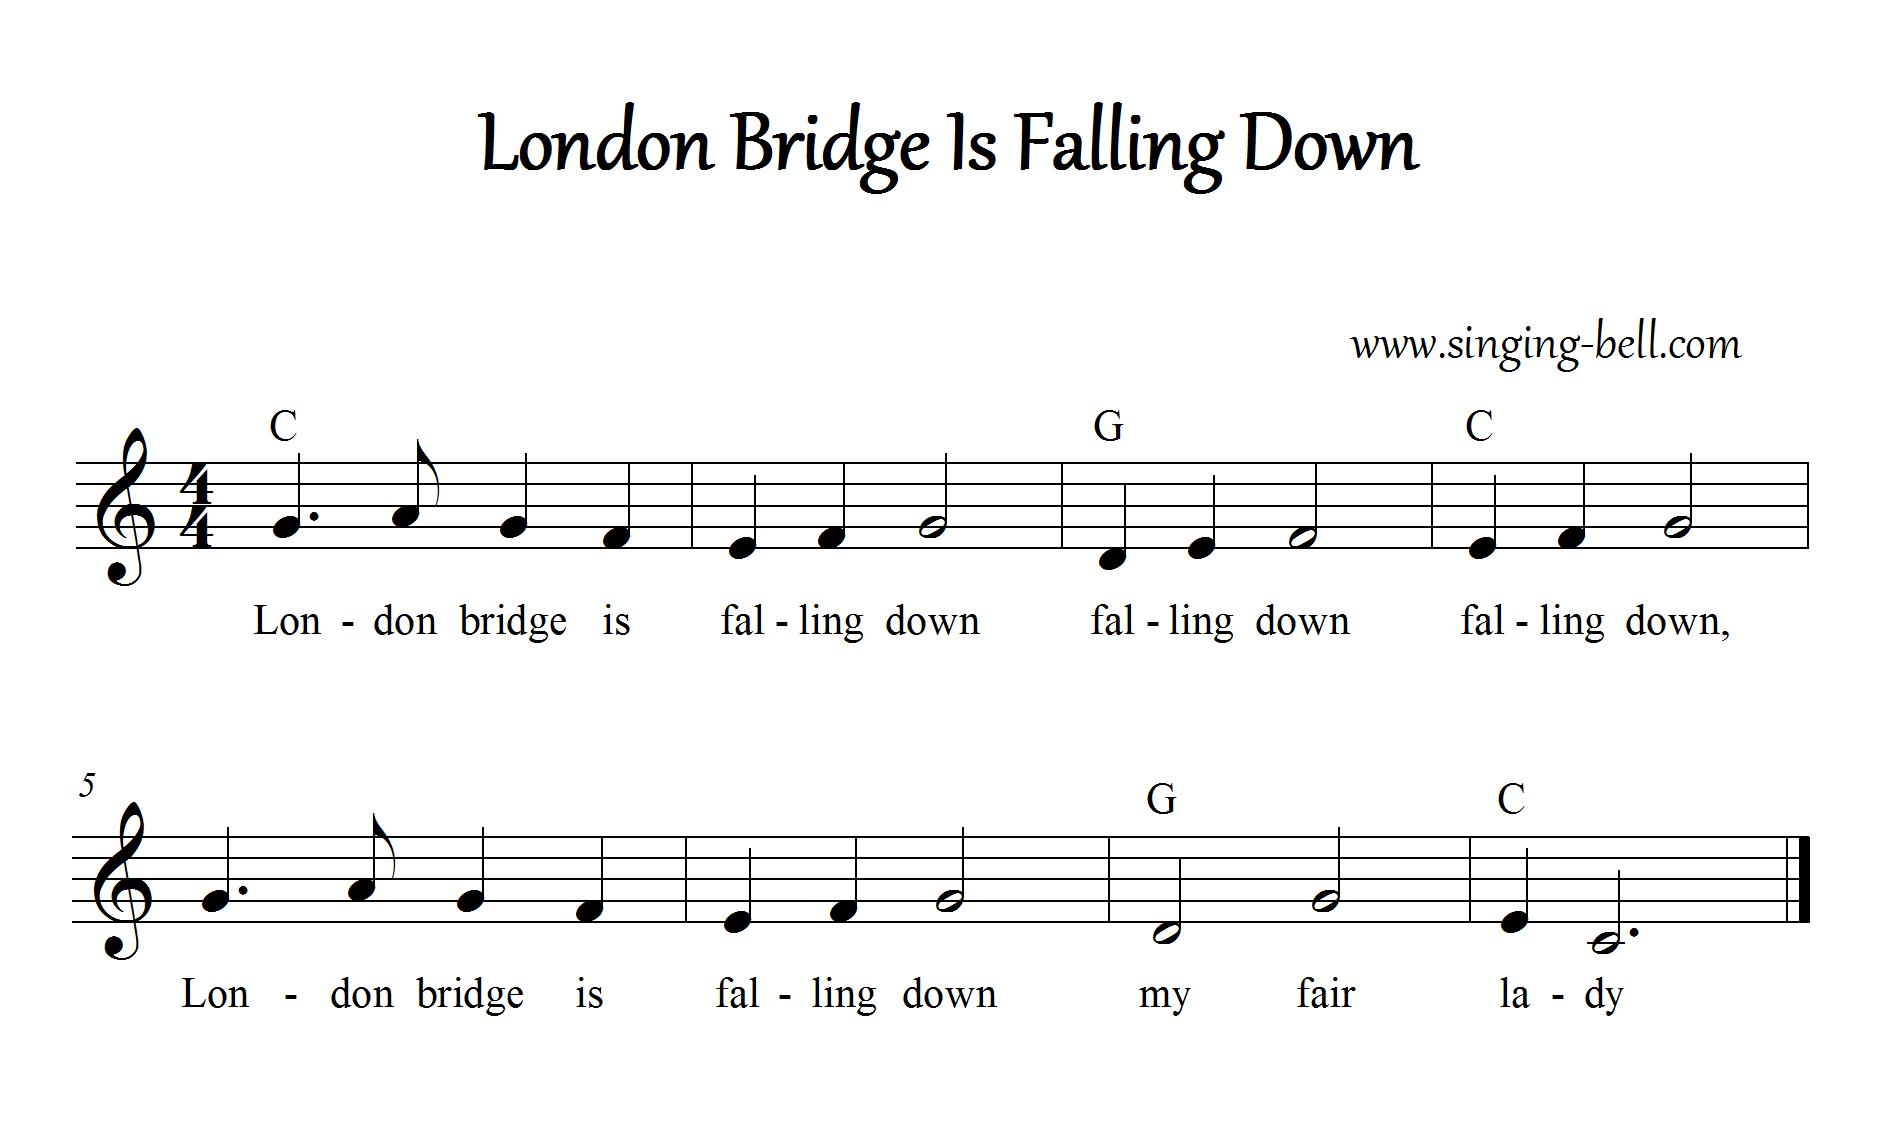 London-Bridge-Is-Falling-Down_singing-bell